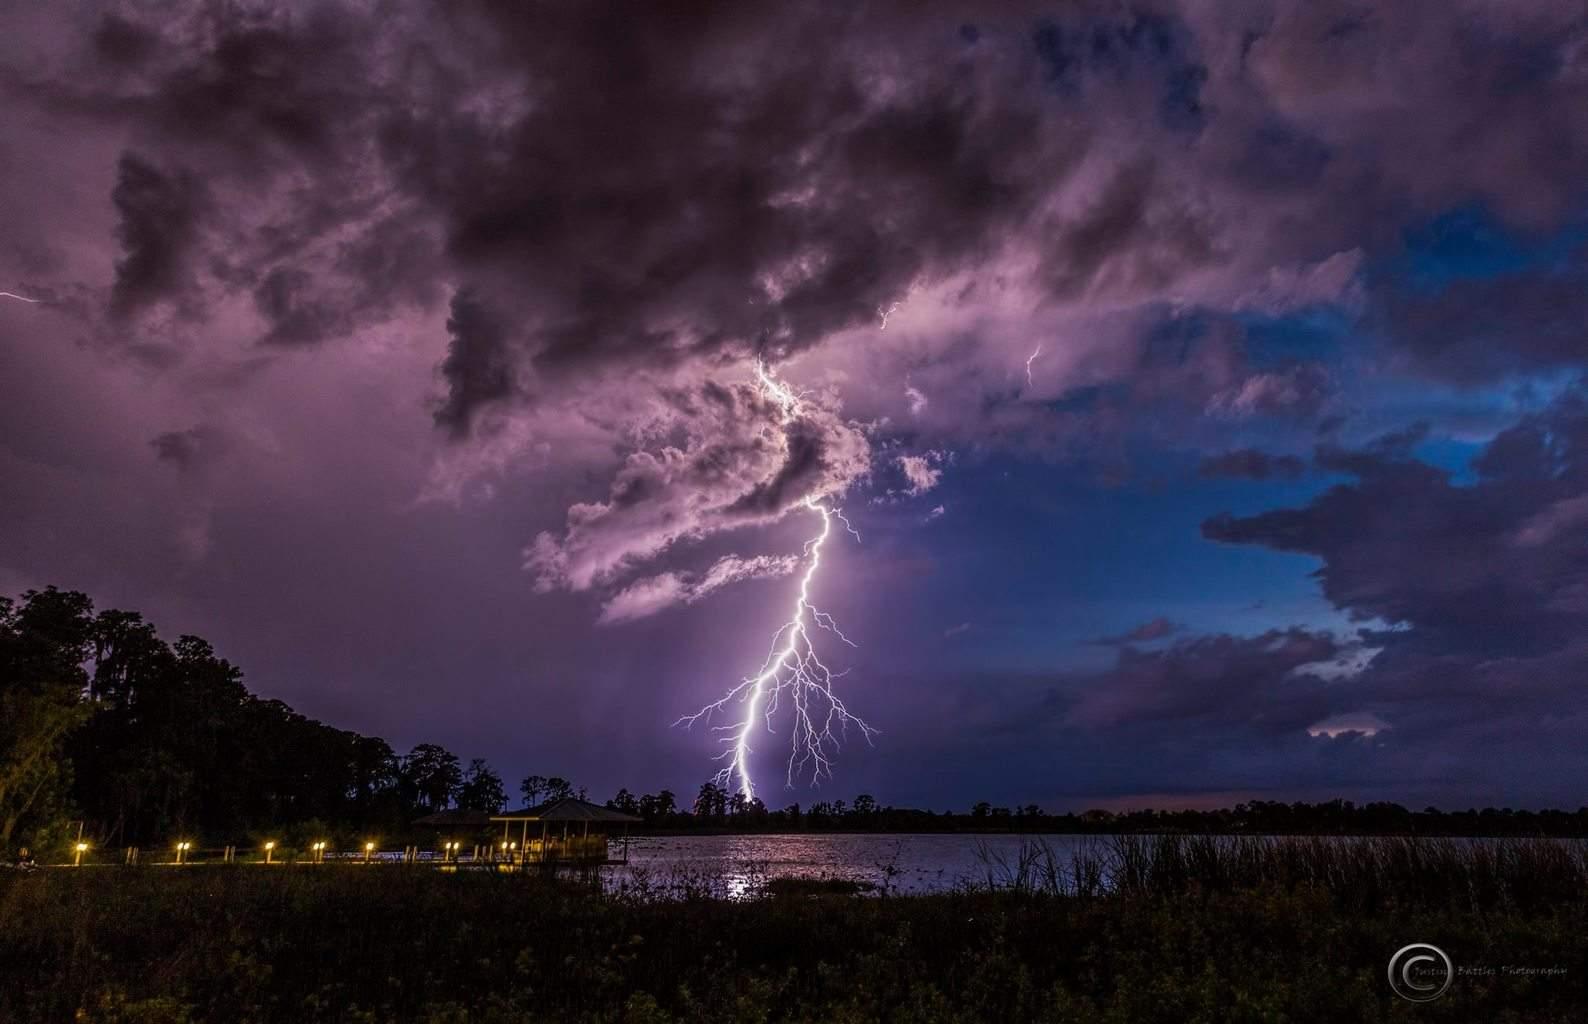 Lake Charlotte in Sebring Florida this evening